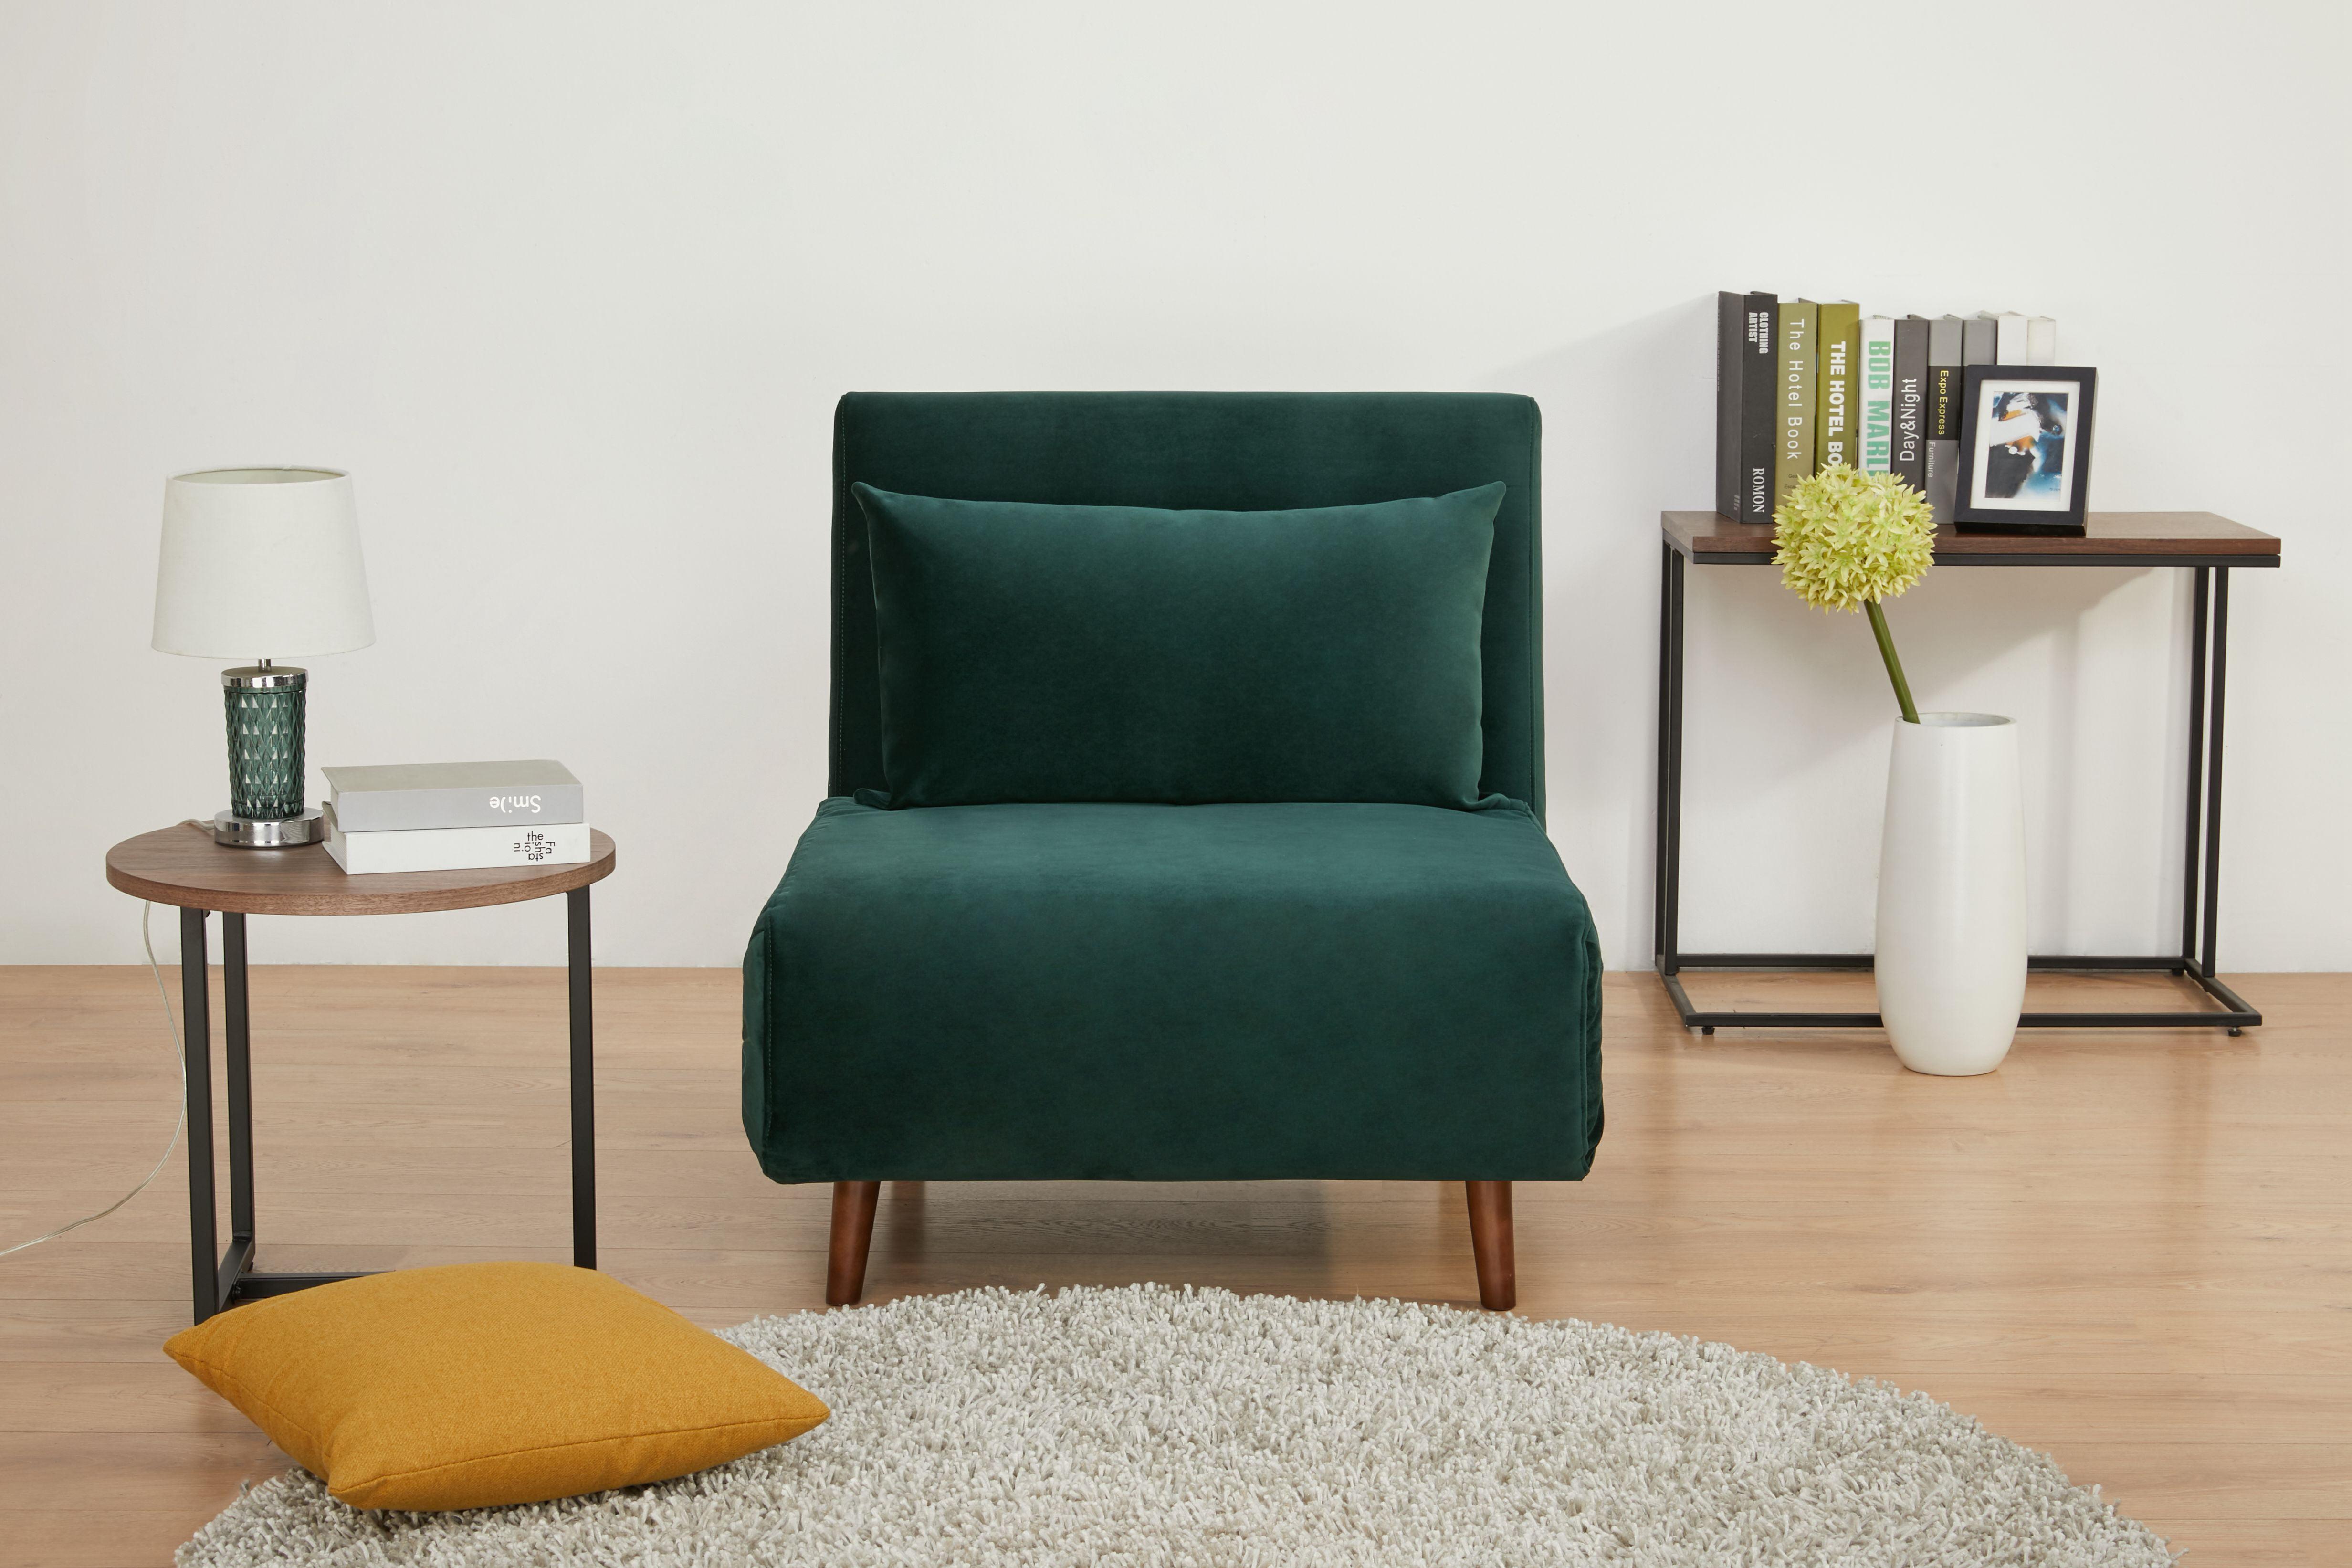 A D Home Tustin Convertible Chair Green Walmart Com Walmart Com